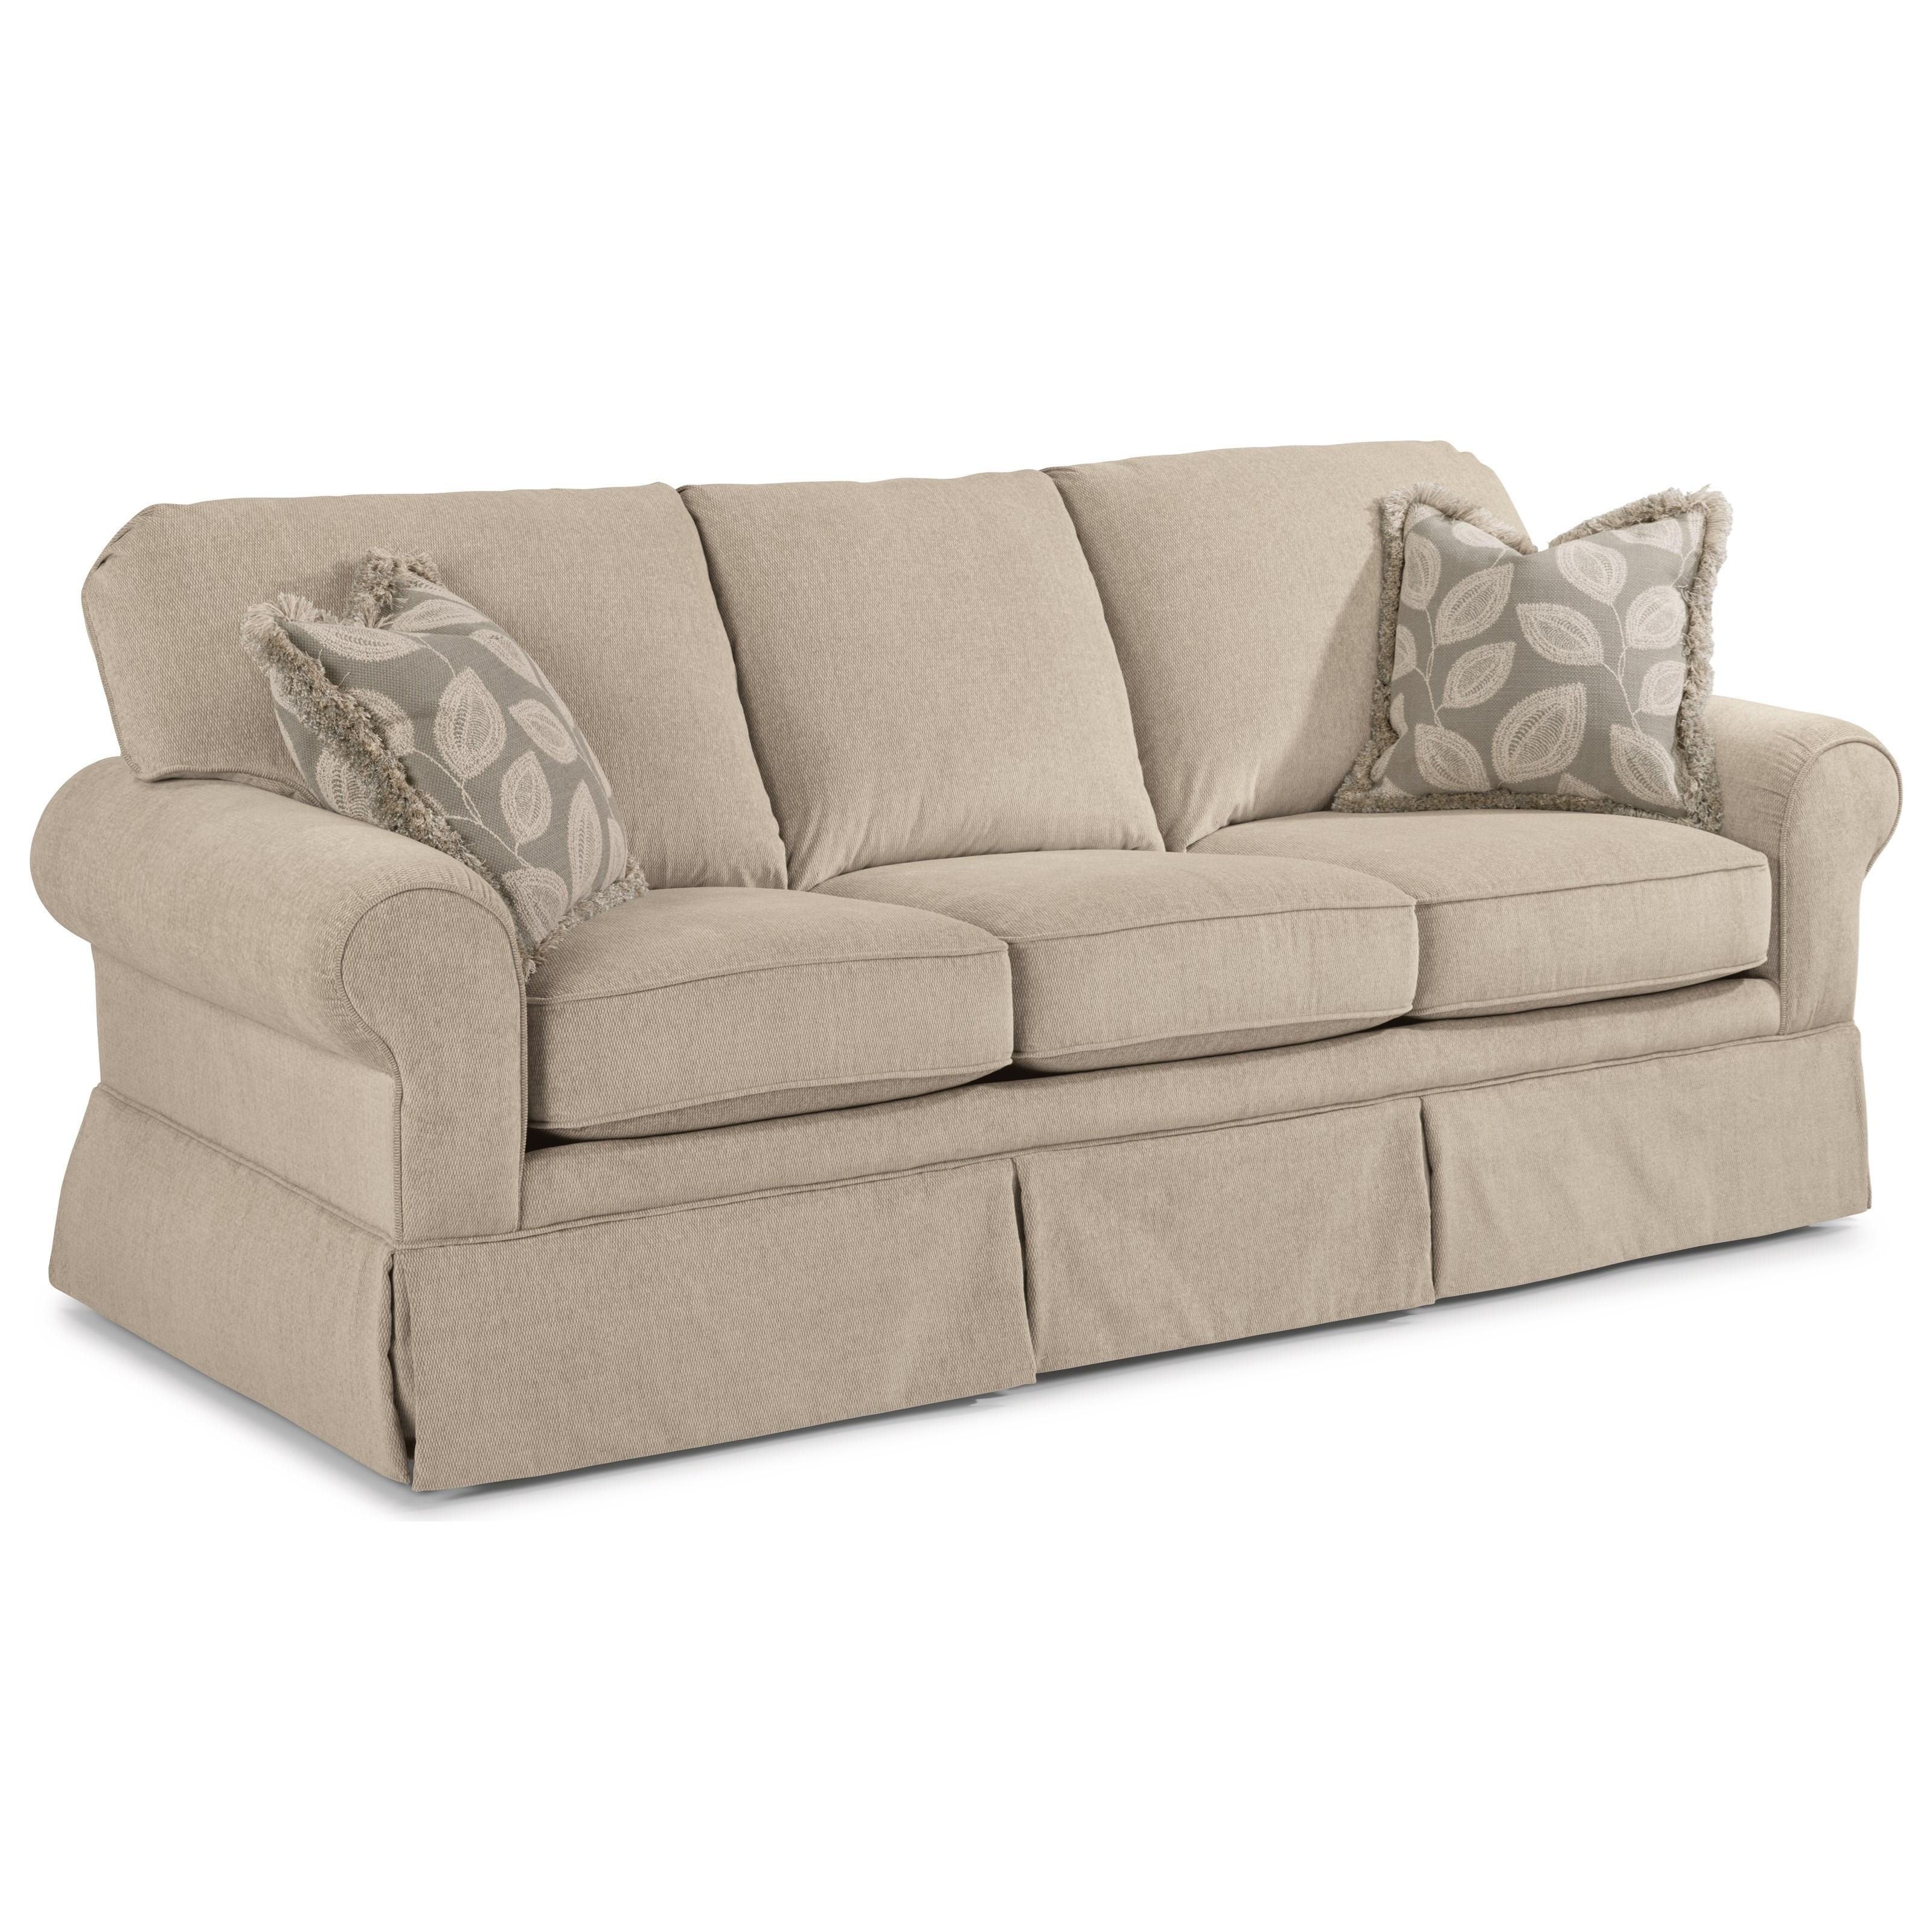 Flexsteel Furniture Telephone Number: Flexsteel Camilla Casual Sofa With Skirted Base